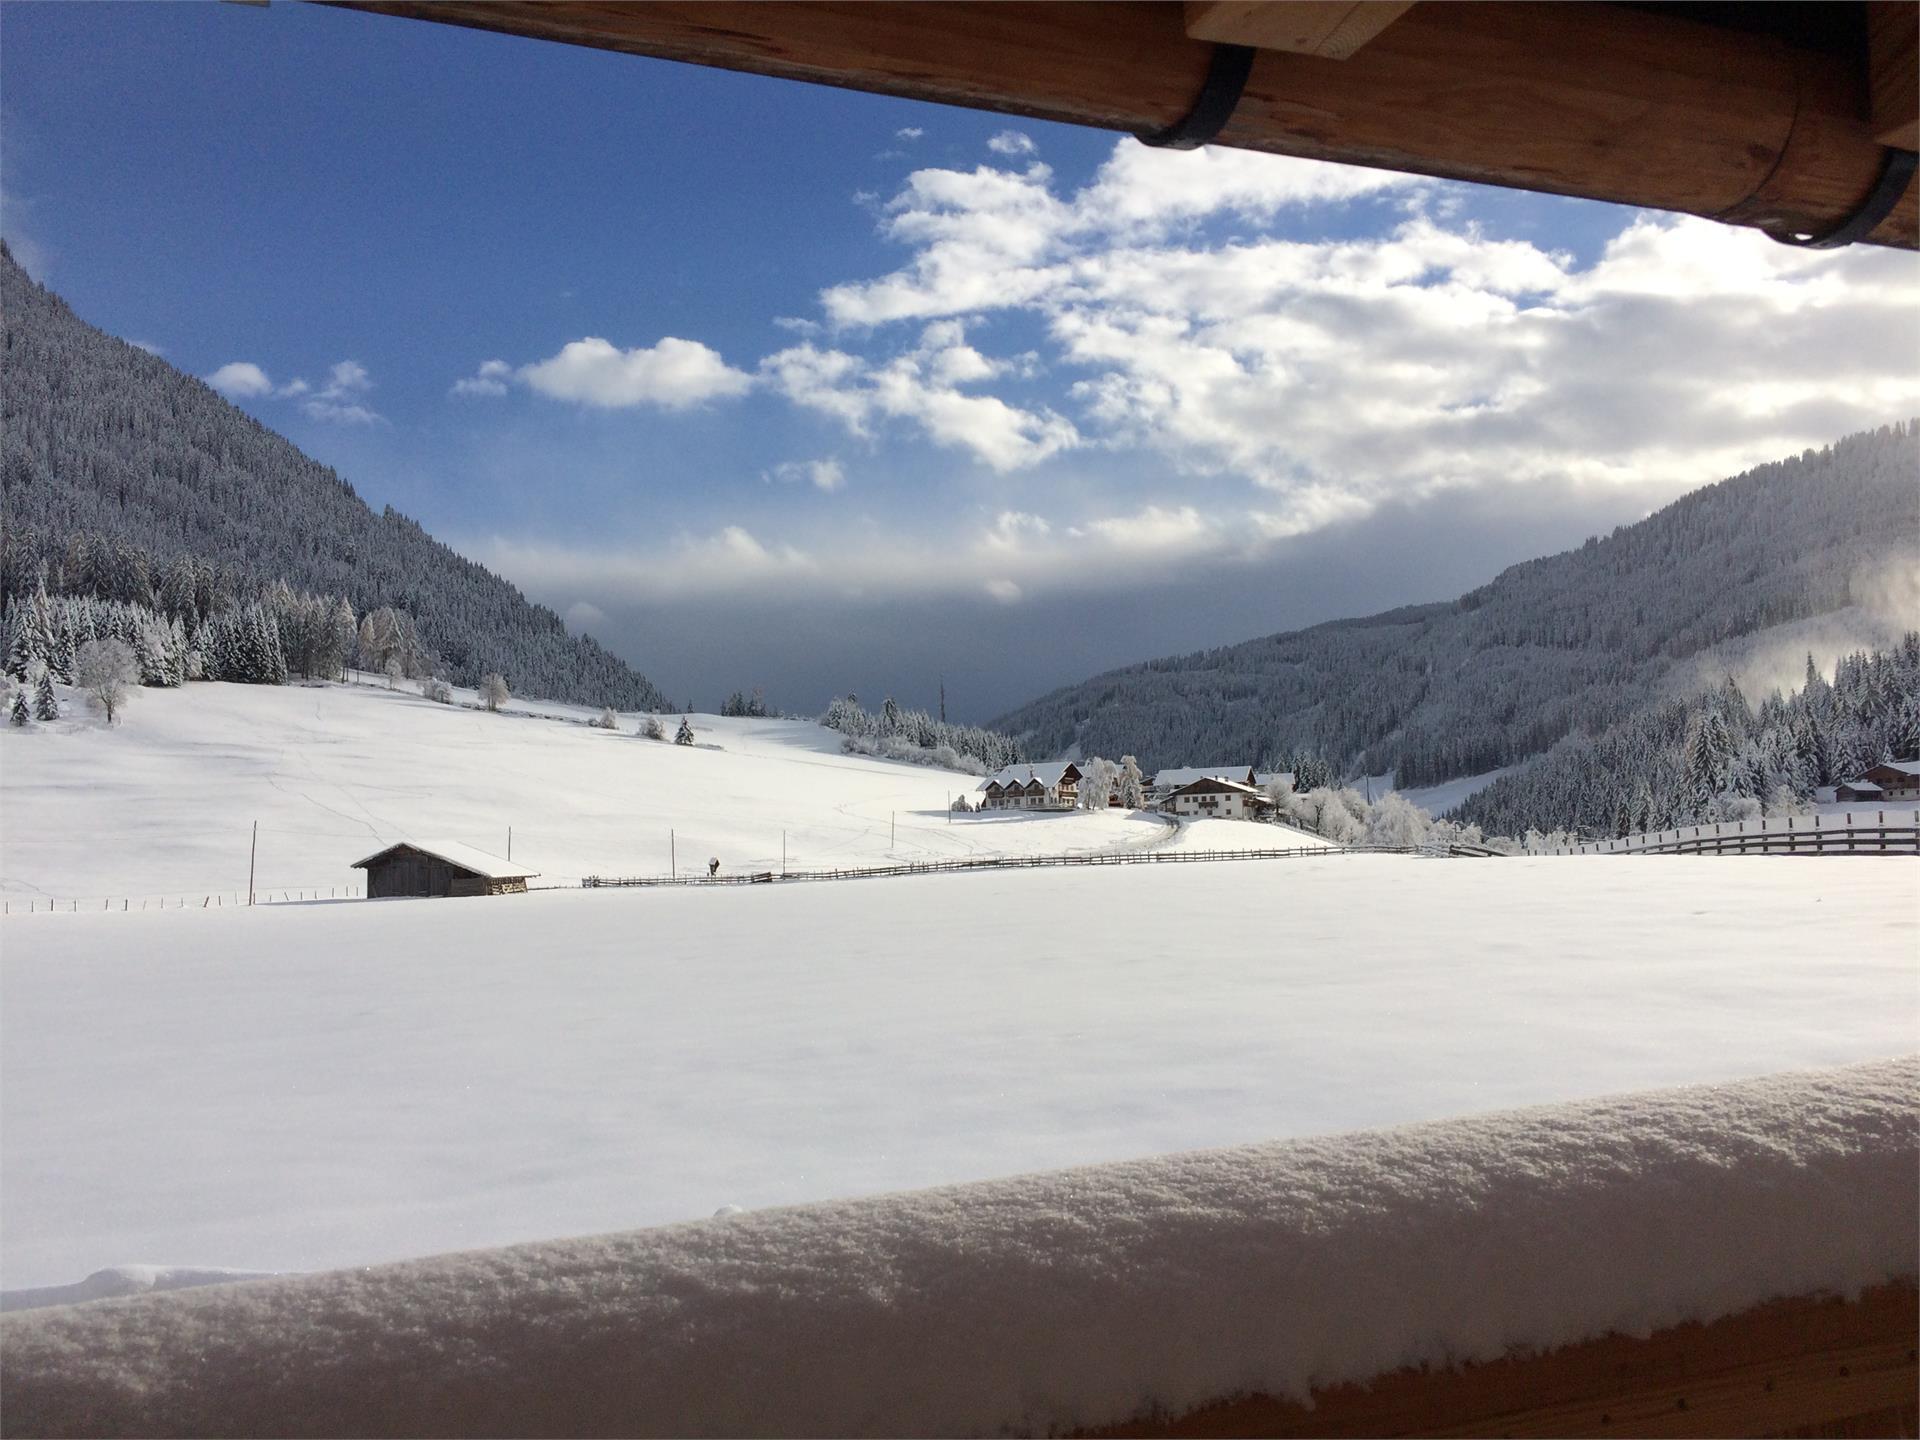 appartamento Karin - vista invernale